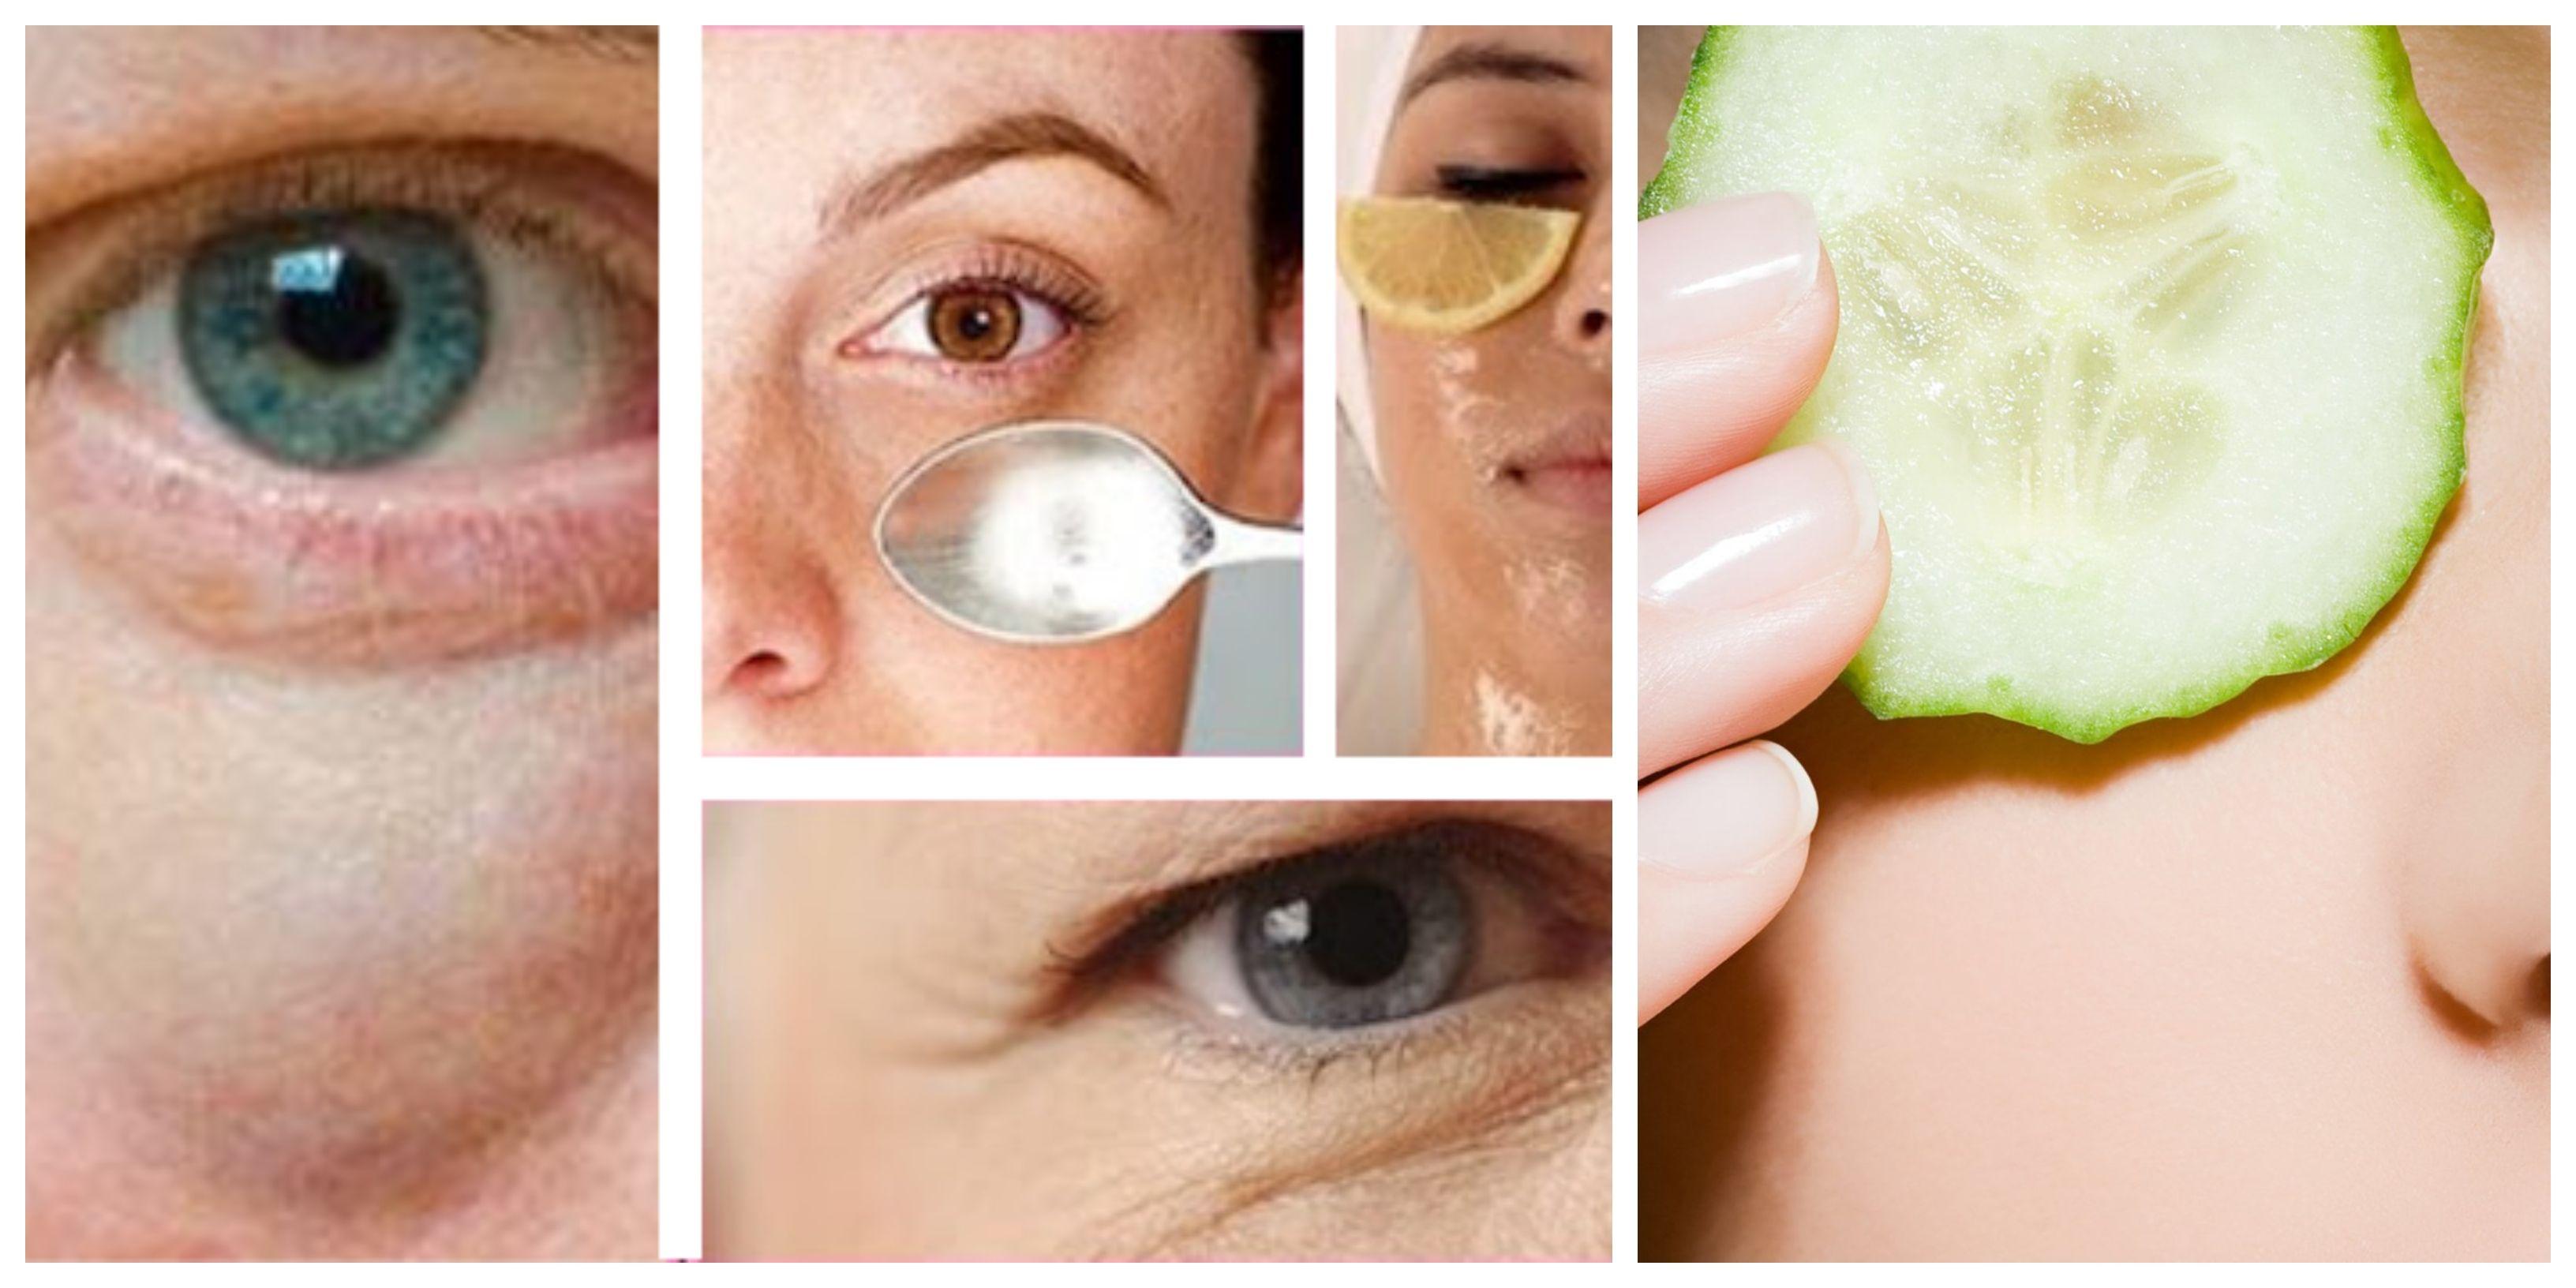 Dunkle Augenringe Entfernen Hausmittel Helfen Naturlich Augenringe Entfernen Dunkle Augenringe Hausmittel